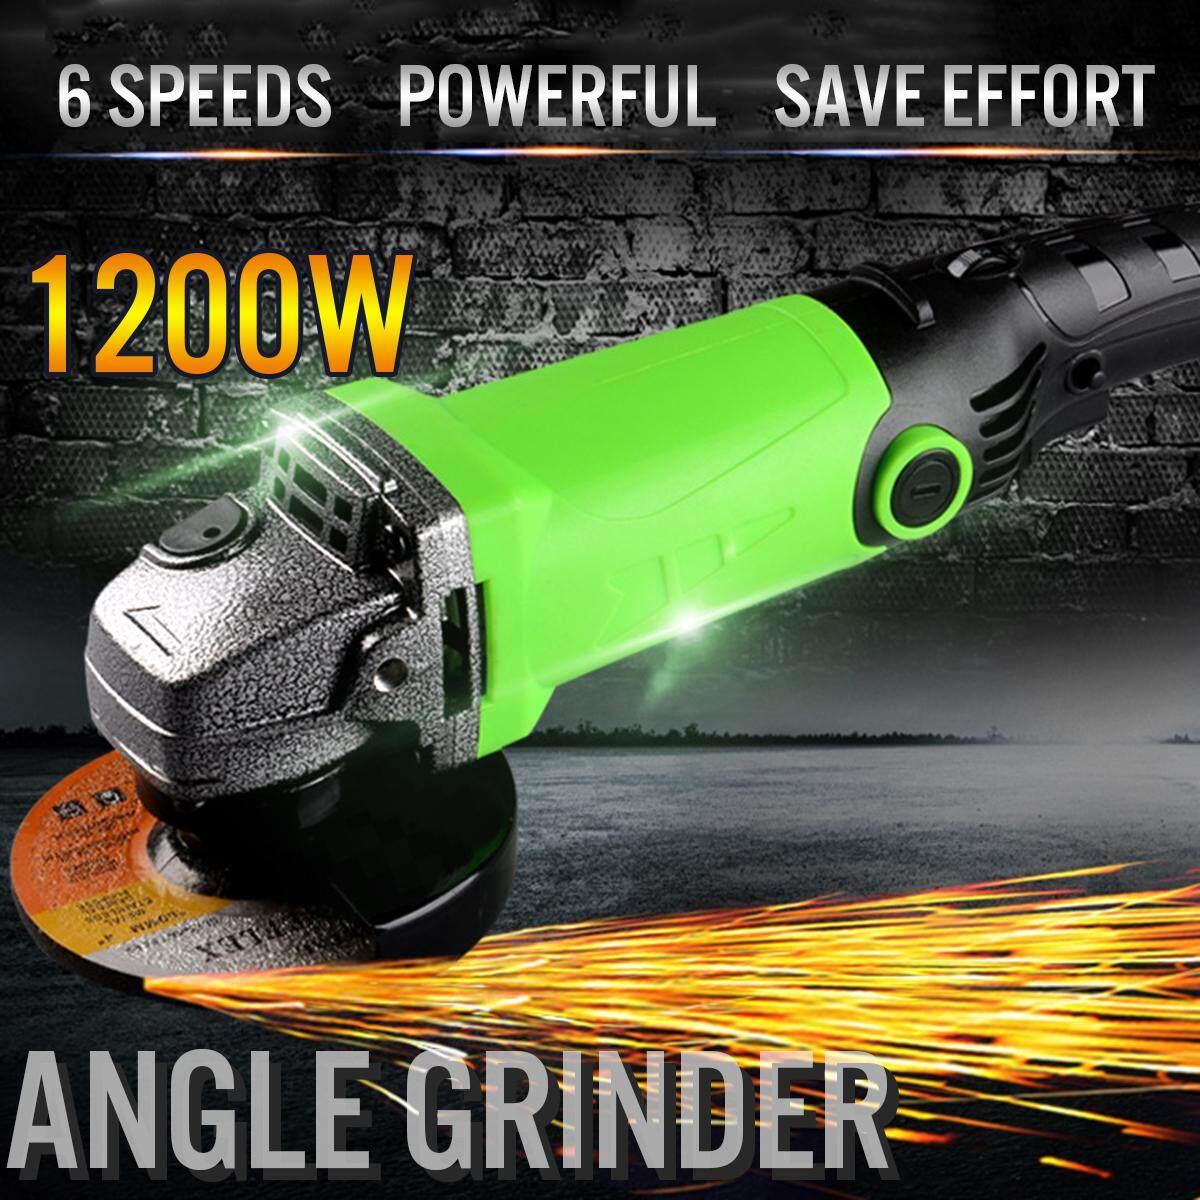 MOD.5107 1200W Multi-function Speed Adjustment Angle Grinder Cutting Polishing